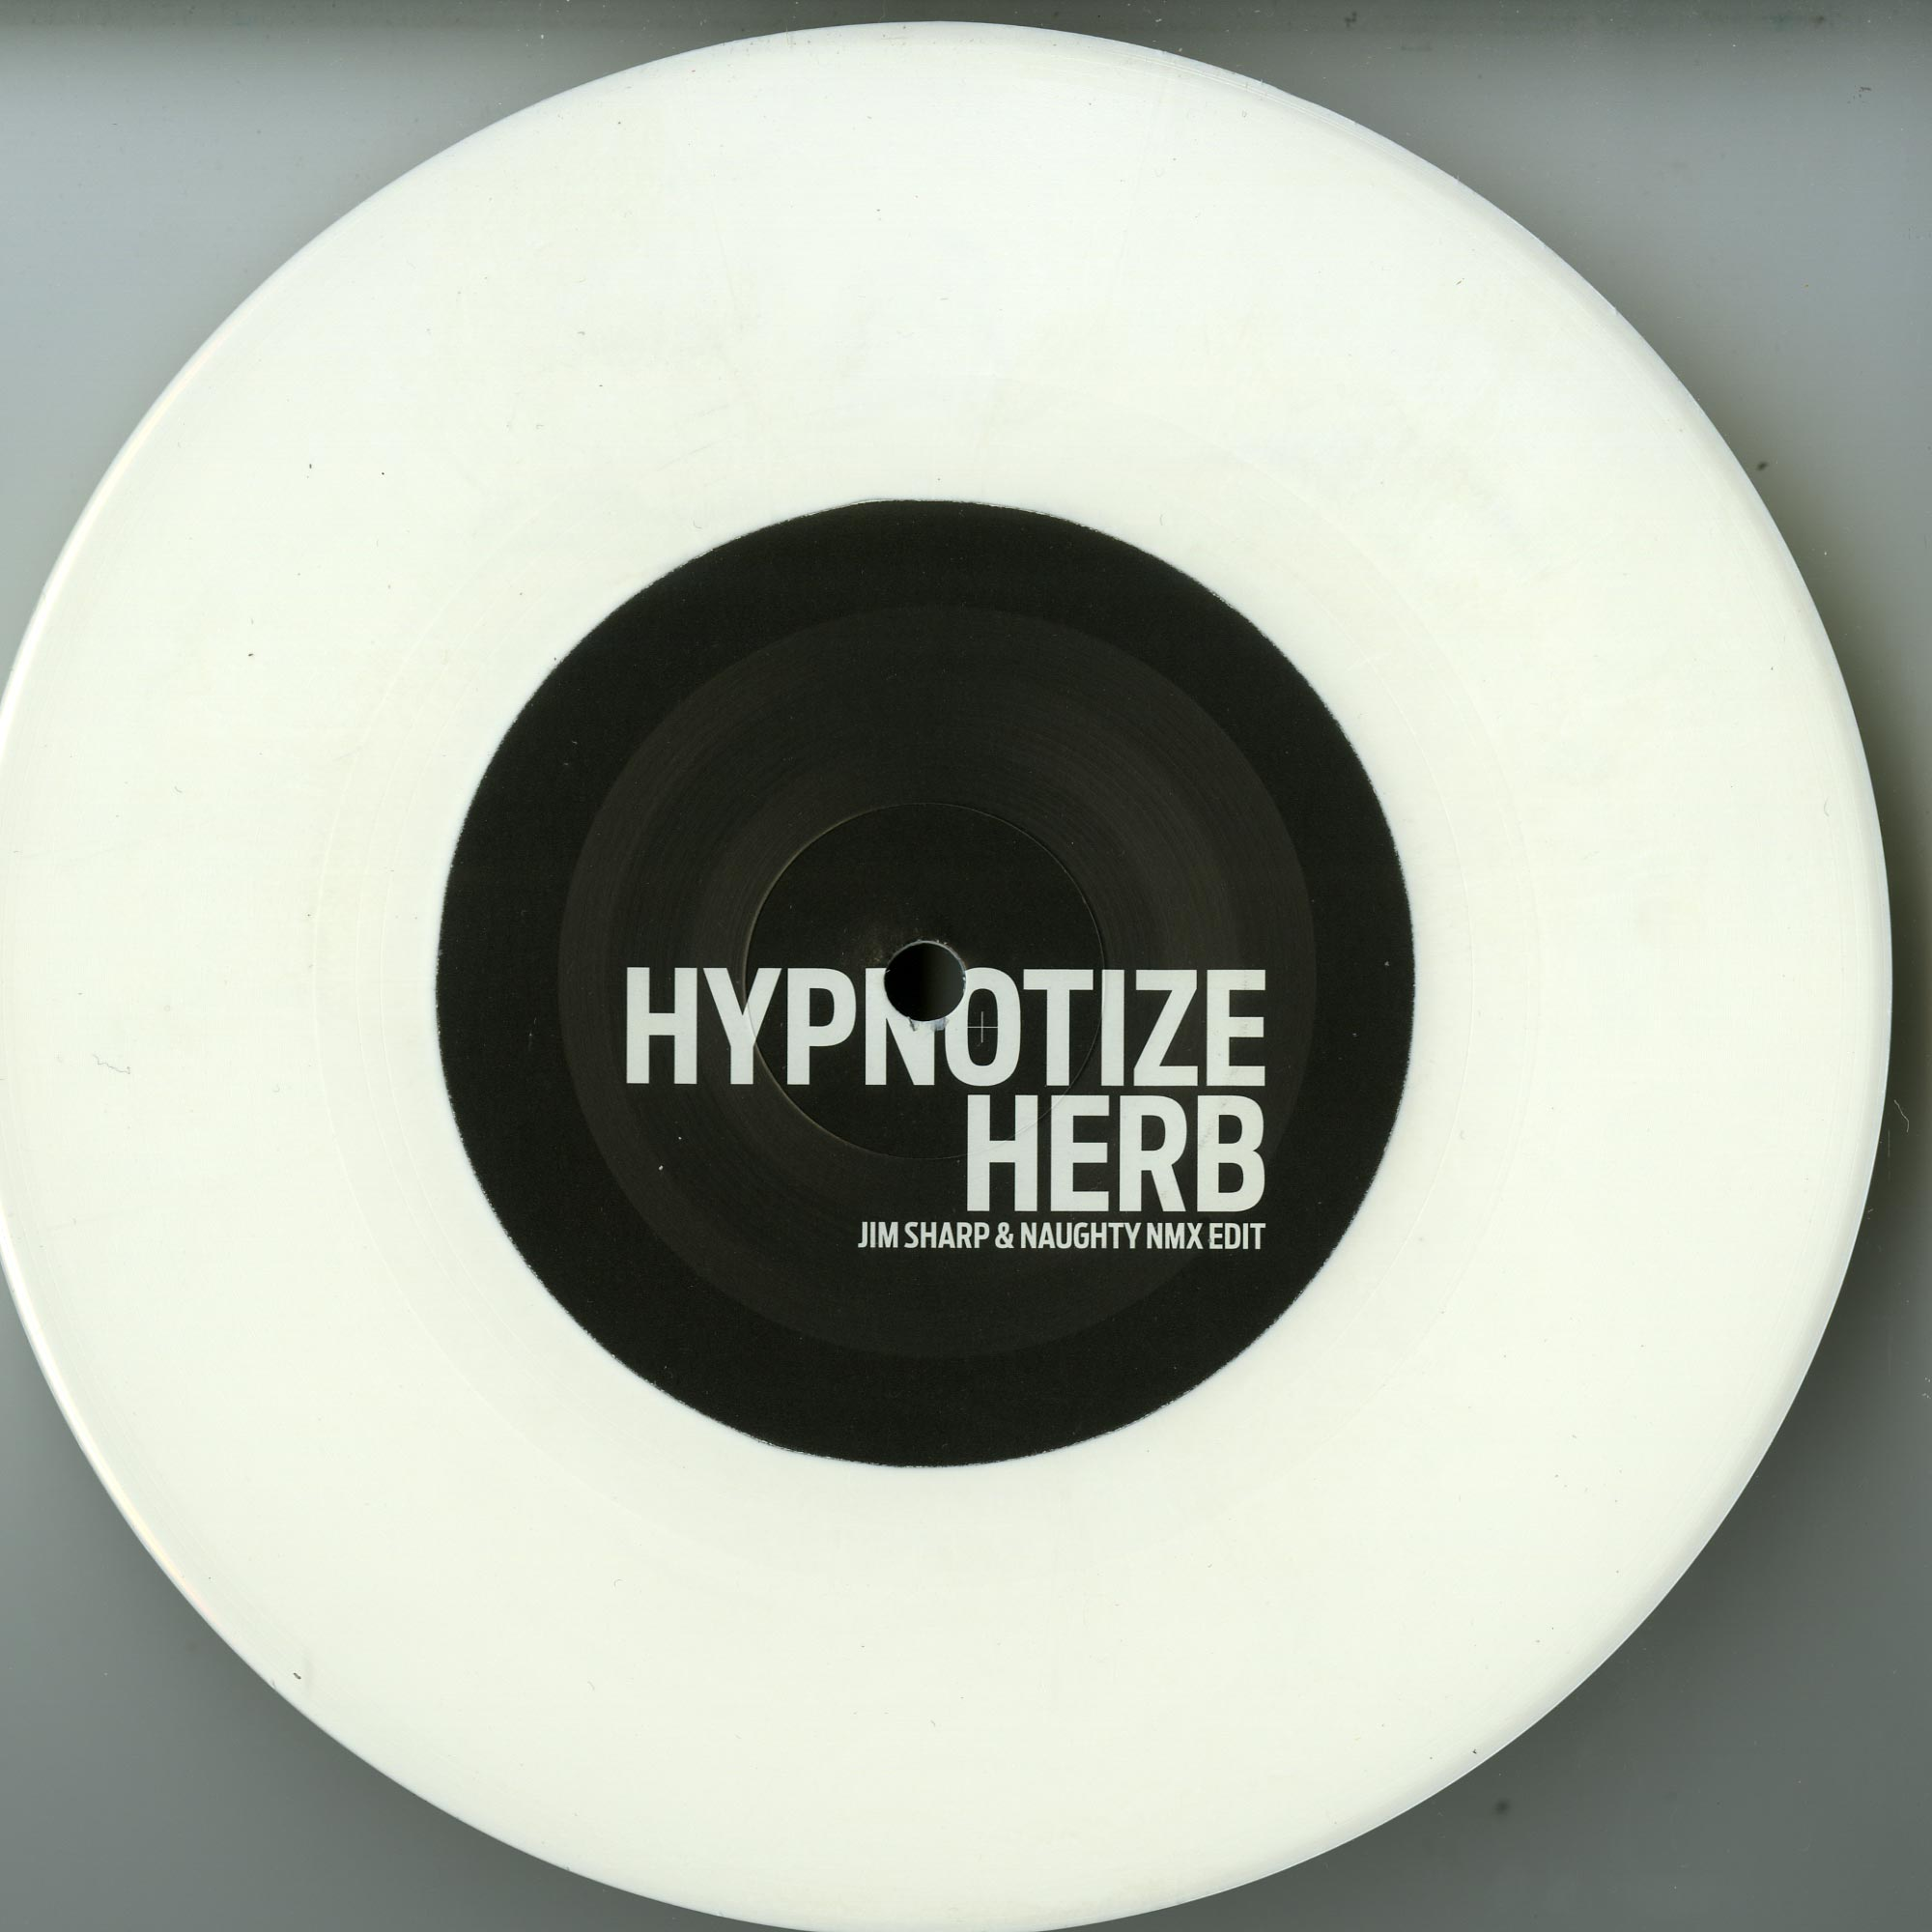 Jim Sharp & Naughty NMX - HYPNOTIZED HERB / DO 4 LOVE